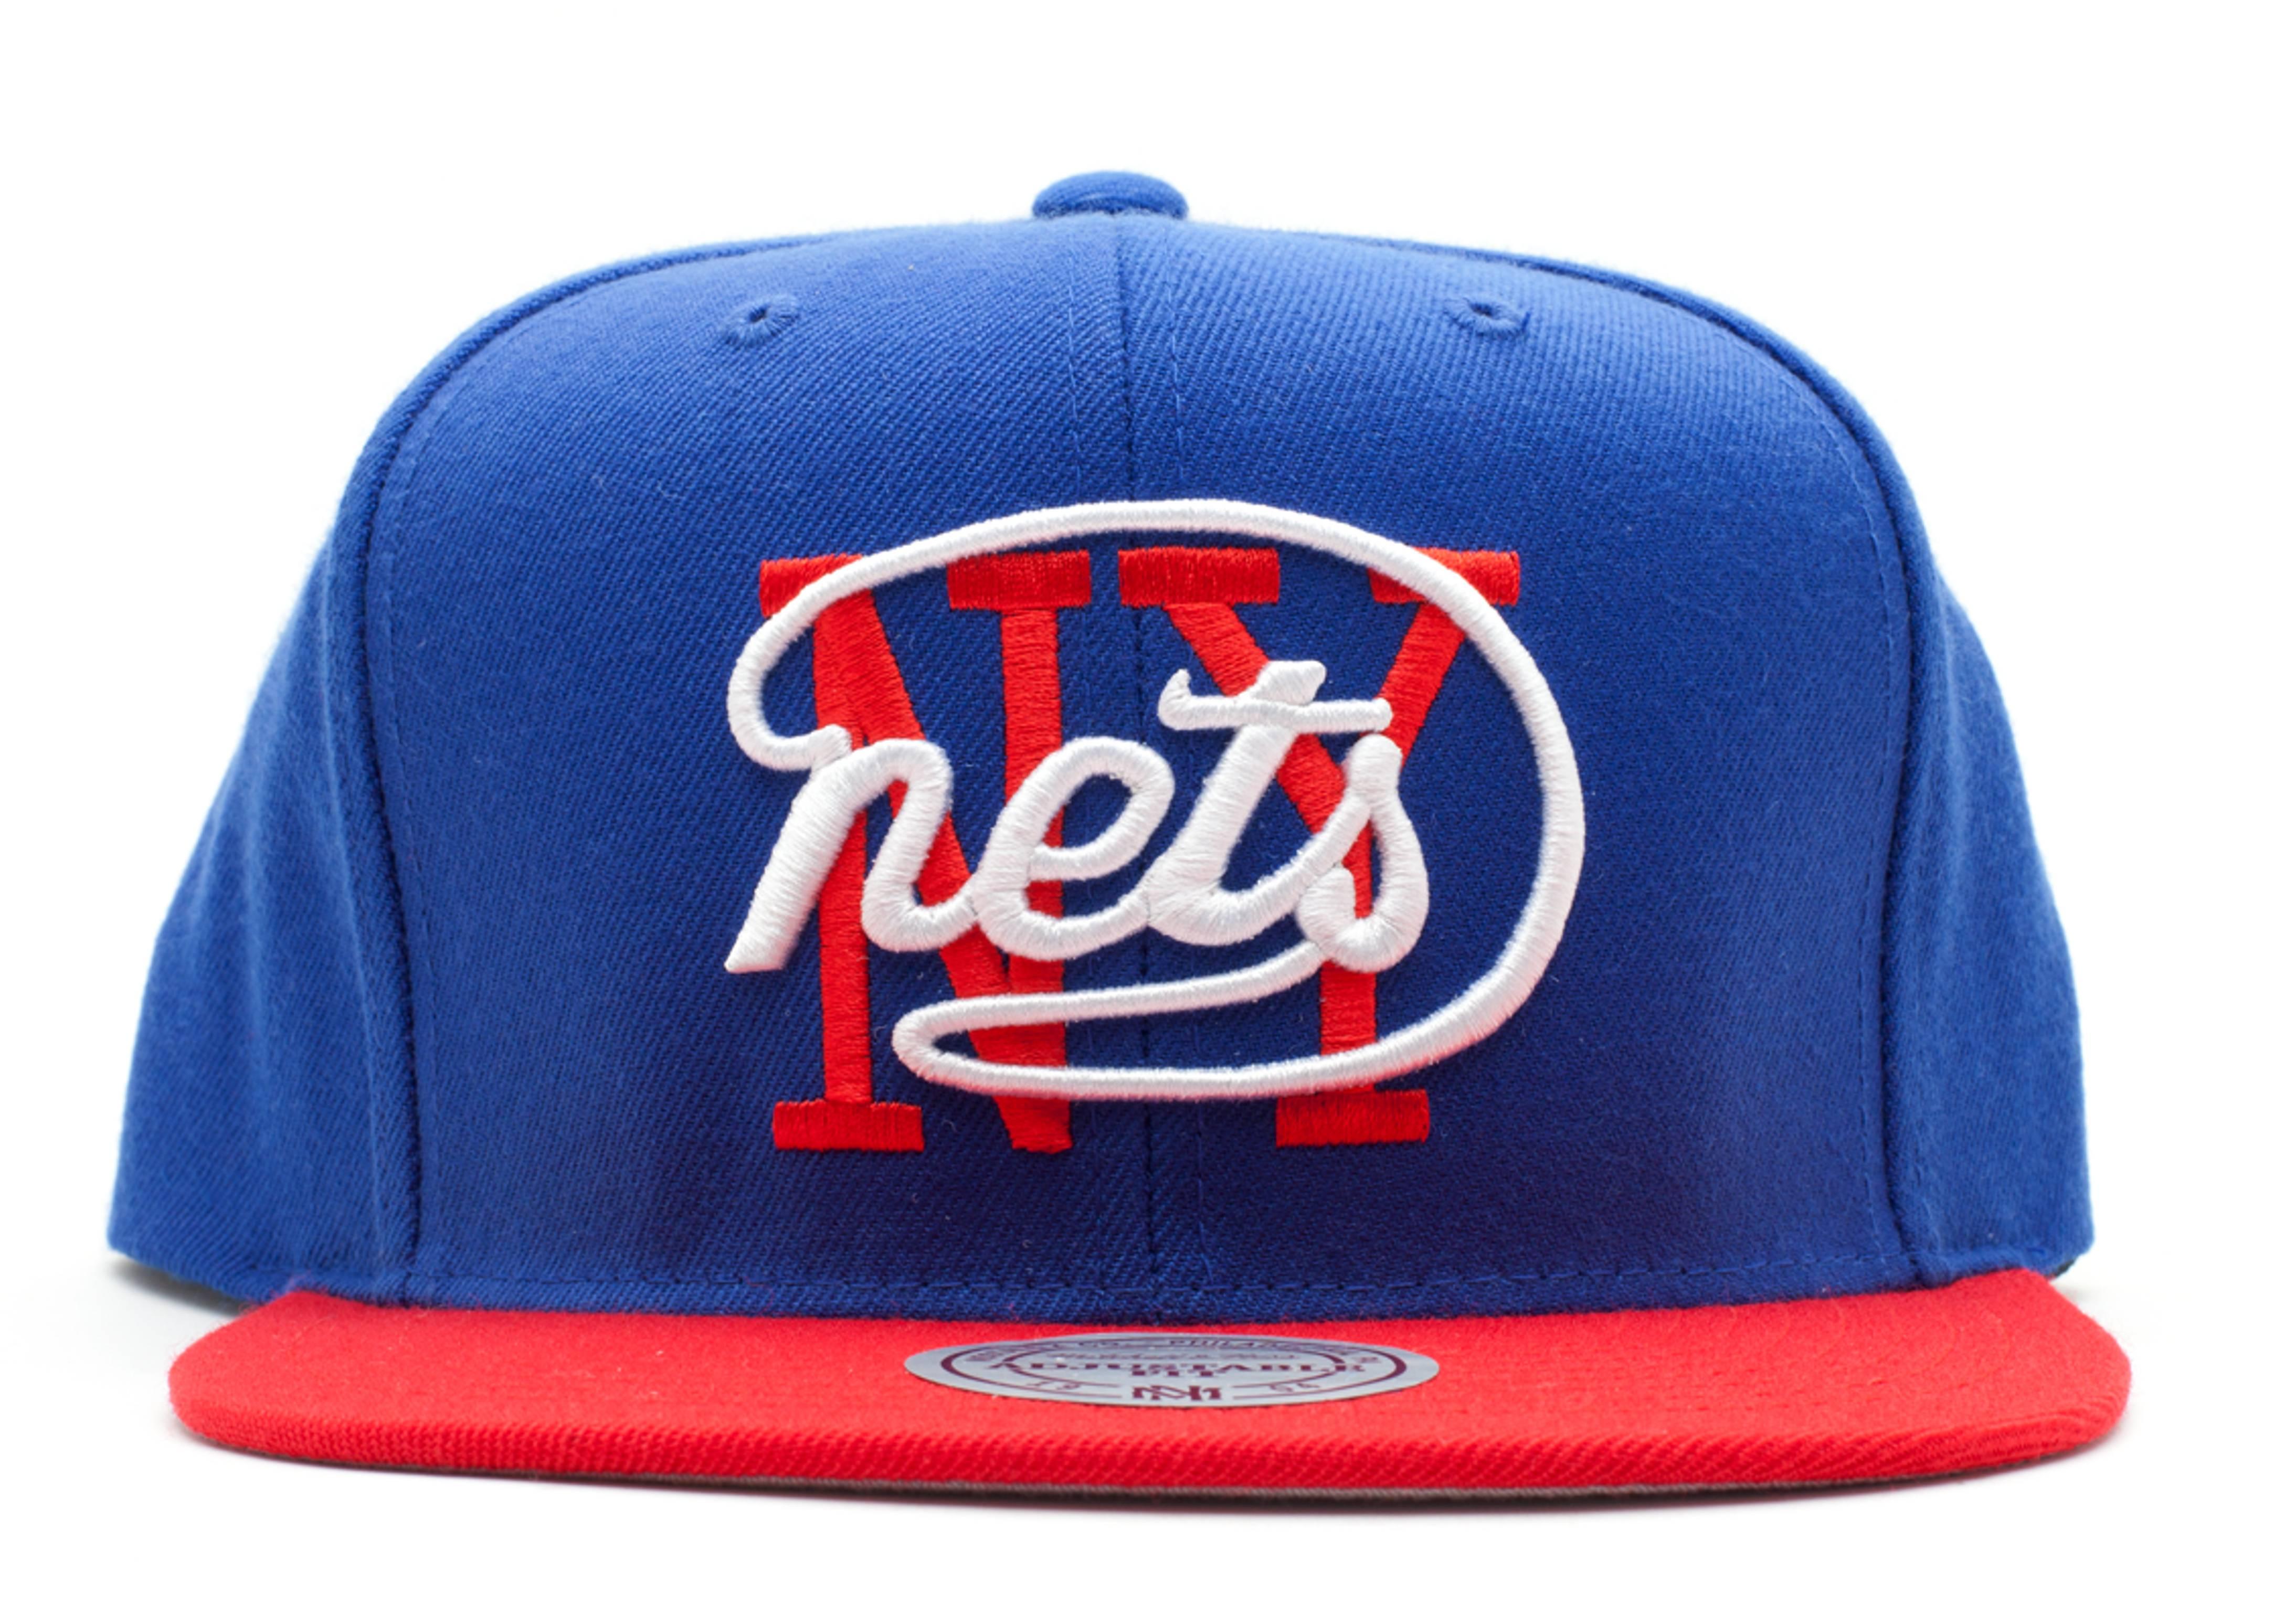 500666a93da New Jersey Nets Snap-back - Mitchell   Ness - ng31mtc5nnets - blue ...